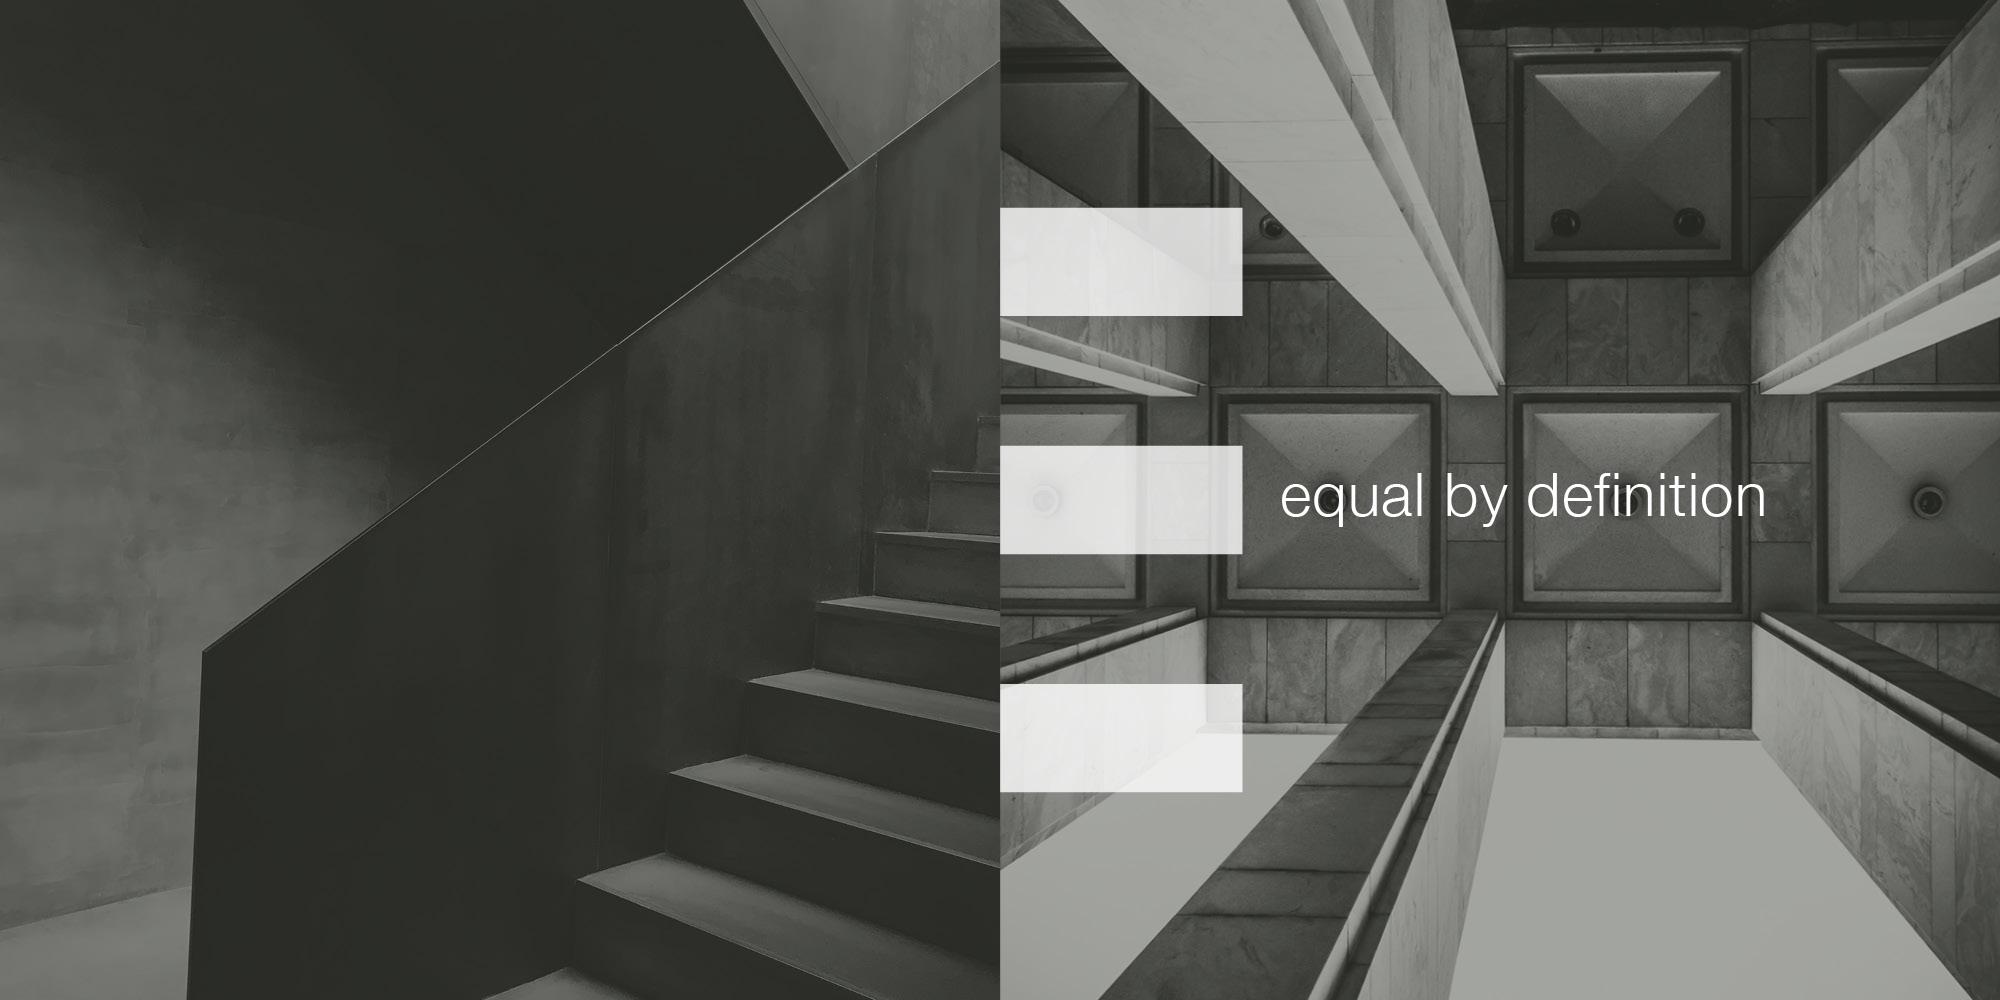 Hug_Folio_Eady Architecture6.jpg